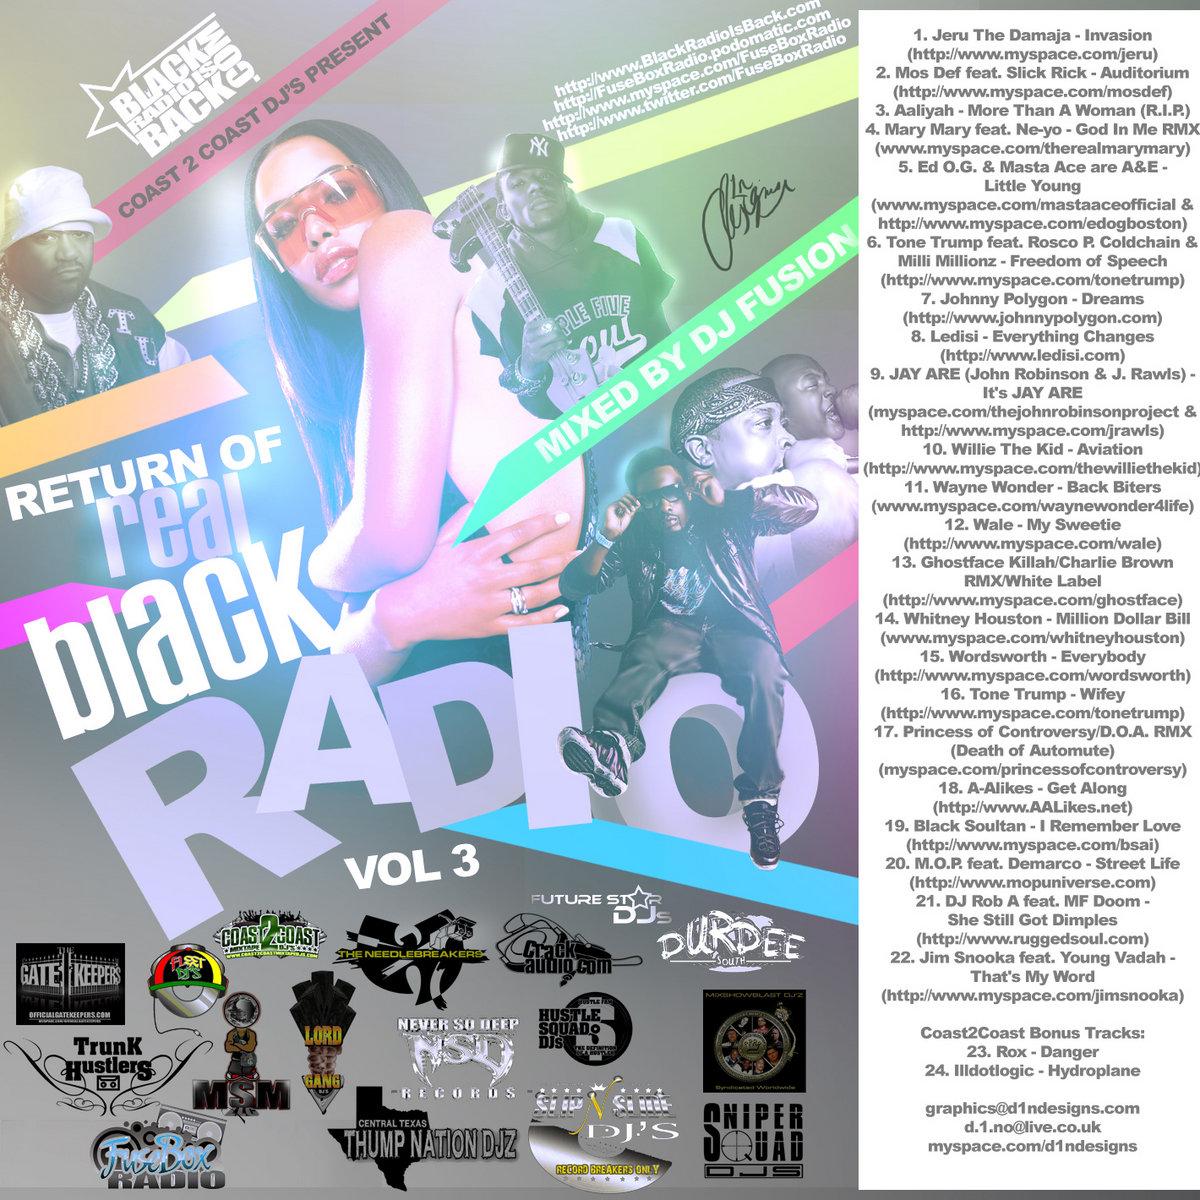 Mos Def Feat Slick Rick Auditorium Fusebox Radio Broadcast W Fuse Box Ads From Coast 2 Djs Present Return Of Real Black Hip Hop Rb Vol 3 By Dj Fusion Jon Judah